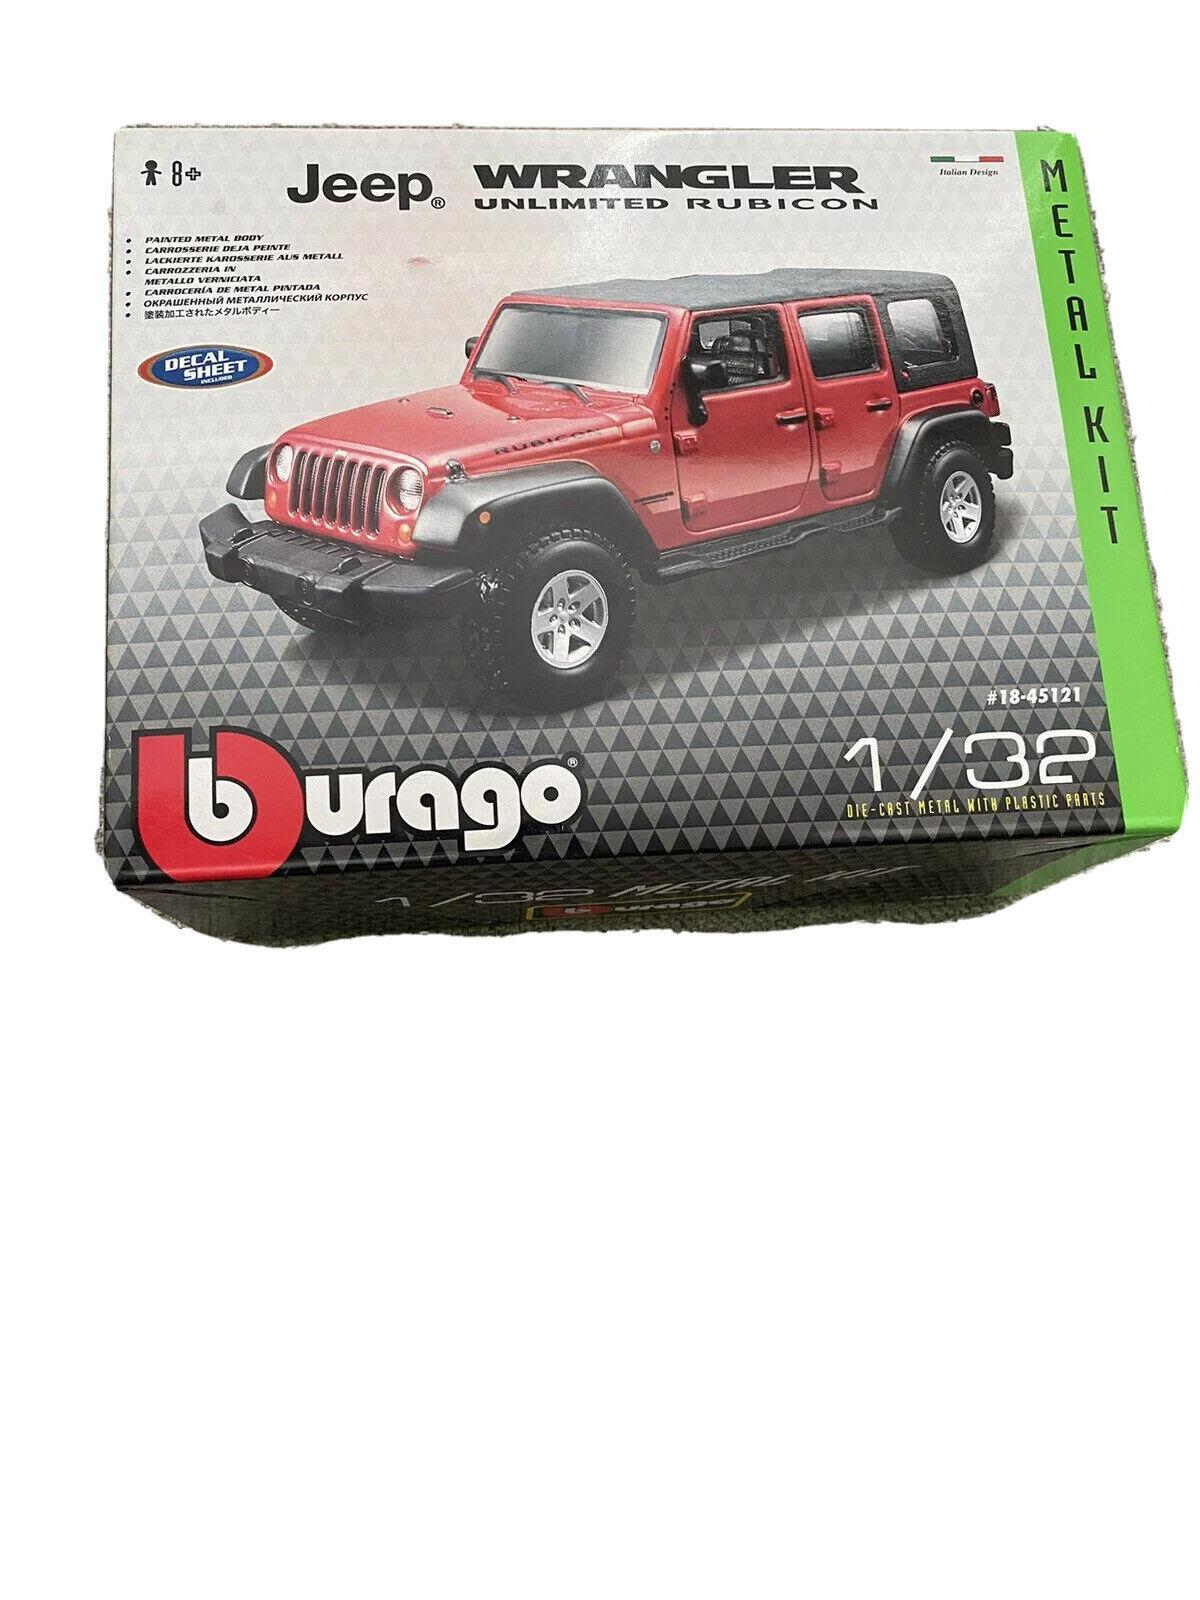 1:32 Scale Bburago B18-45121 Jeep Wrangler Unlimited Rubicon Model Kit